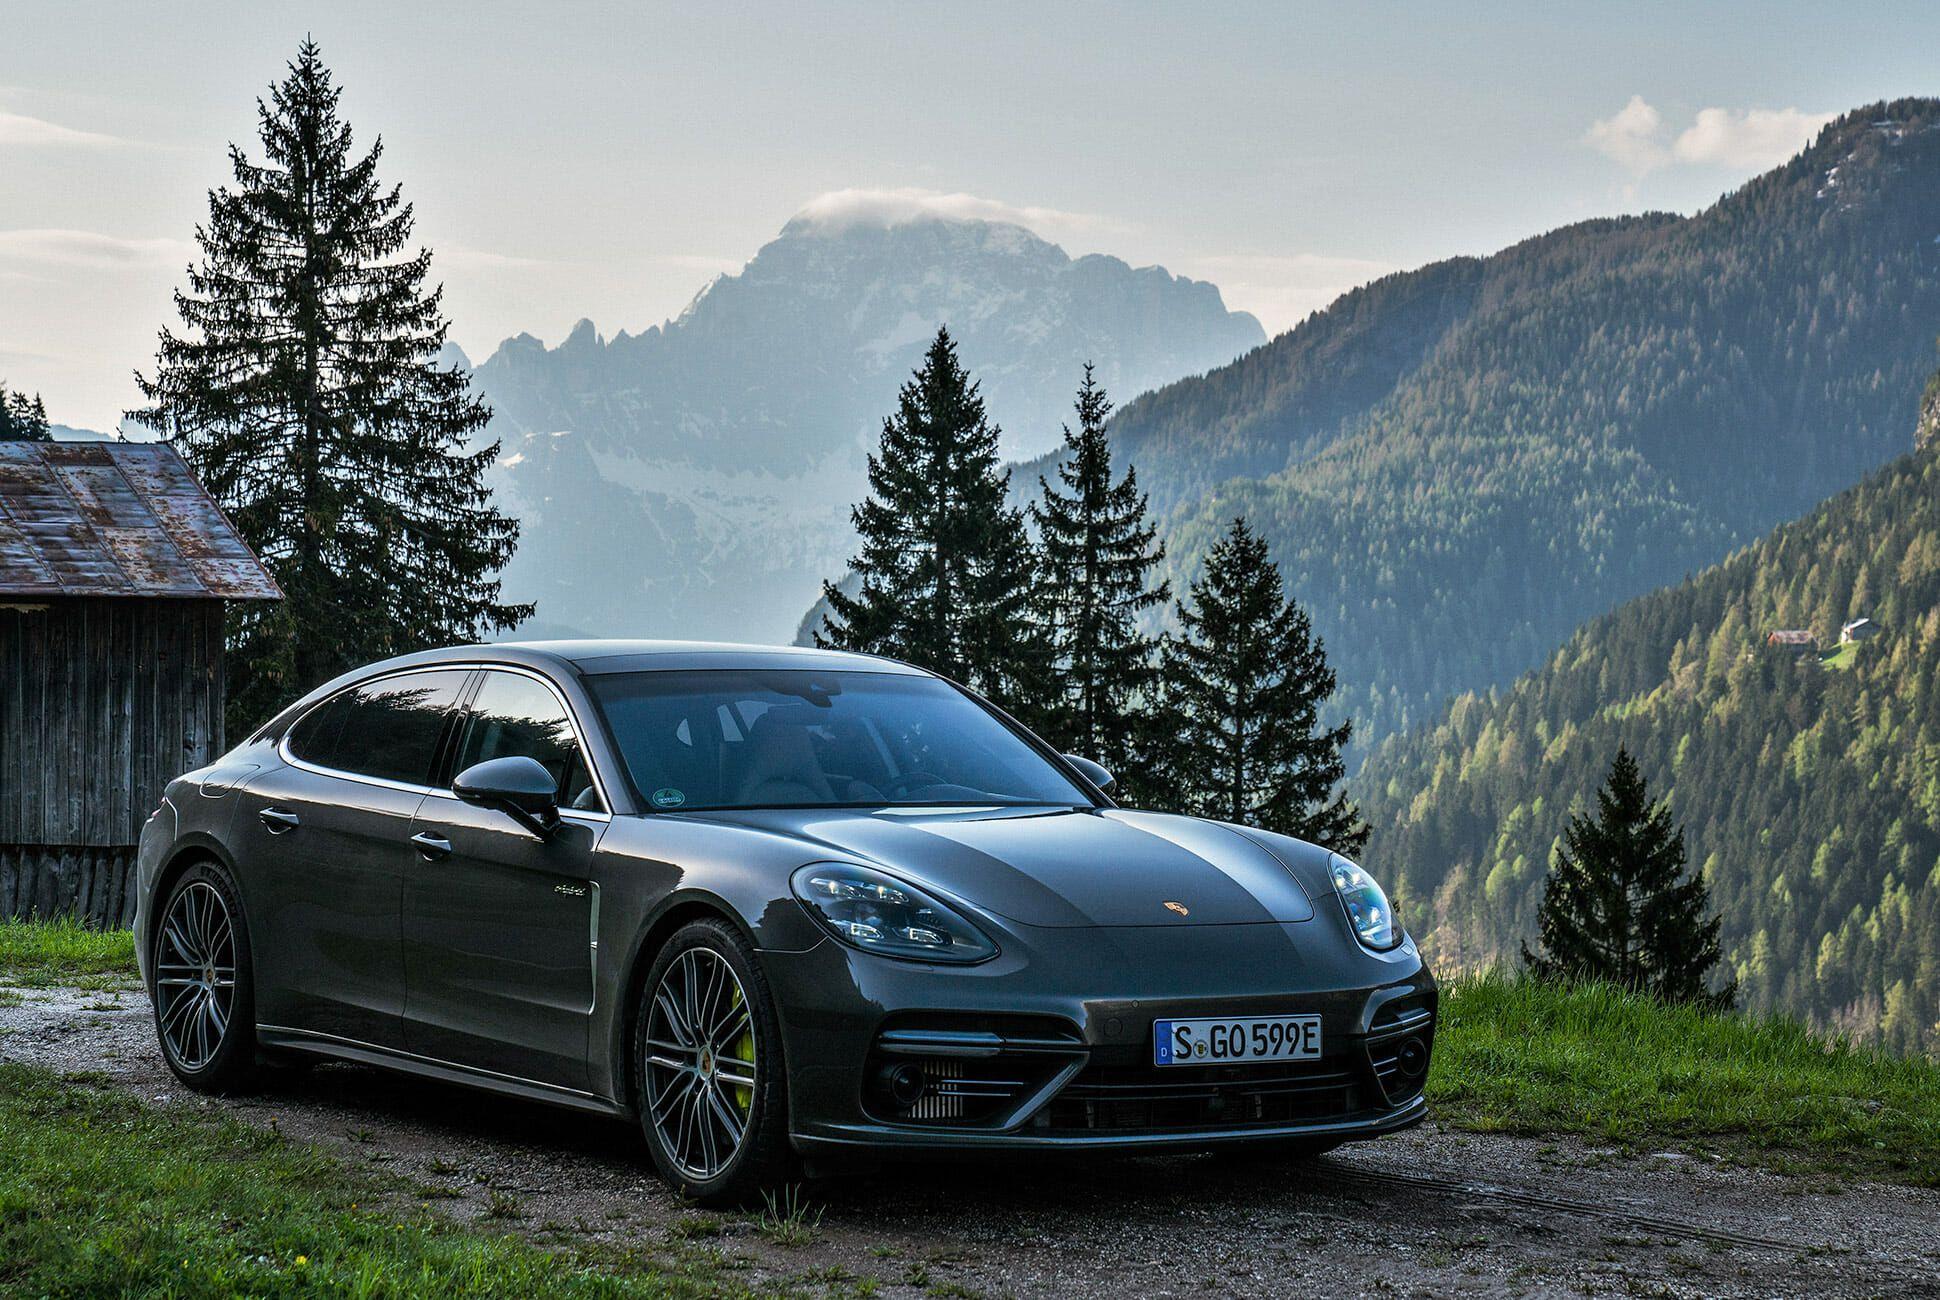 Porsche-Panamera-Executive-Review-gear-patrol-slide-5